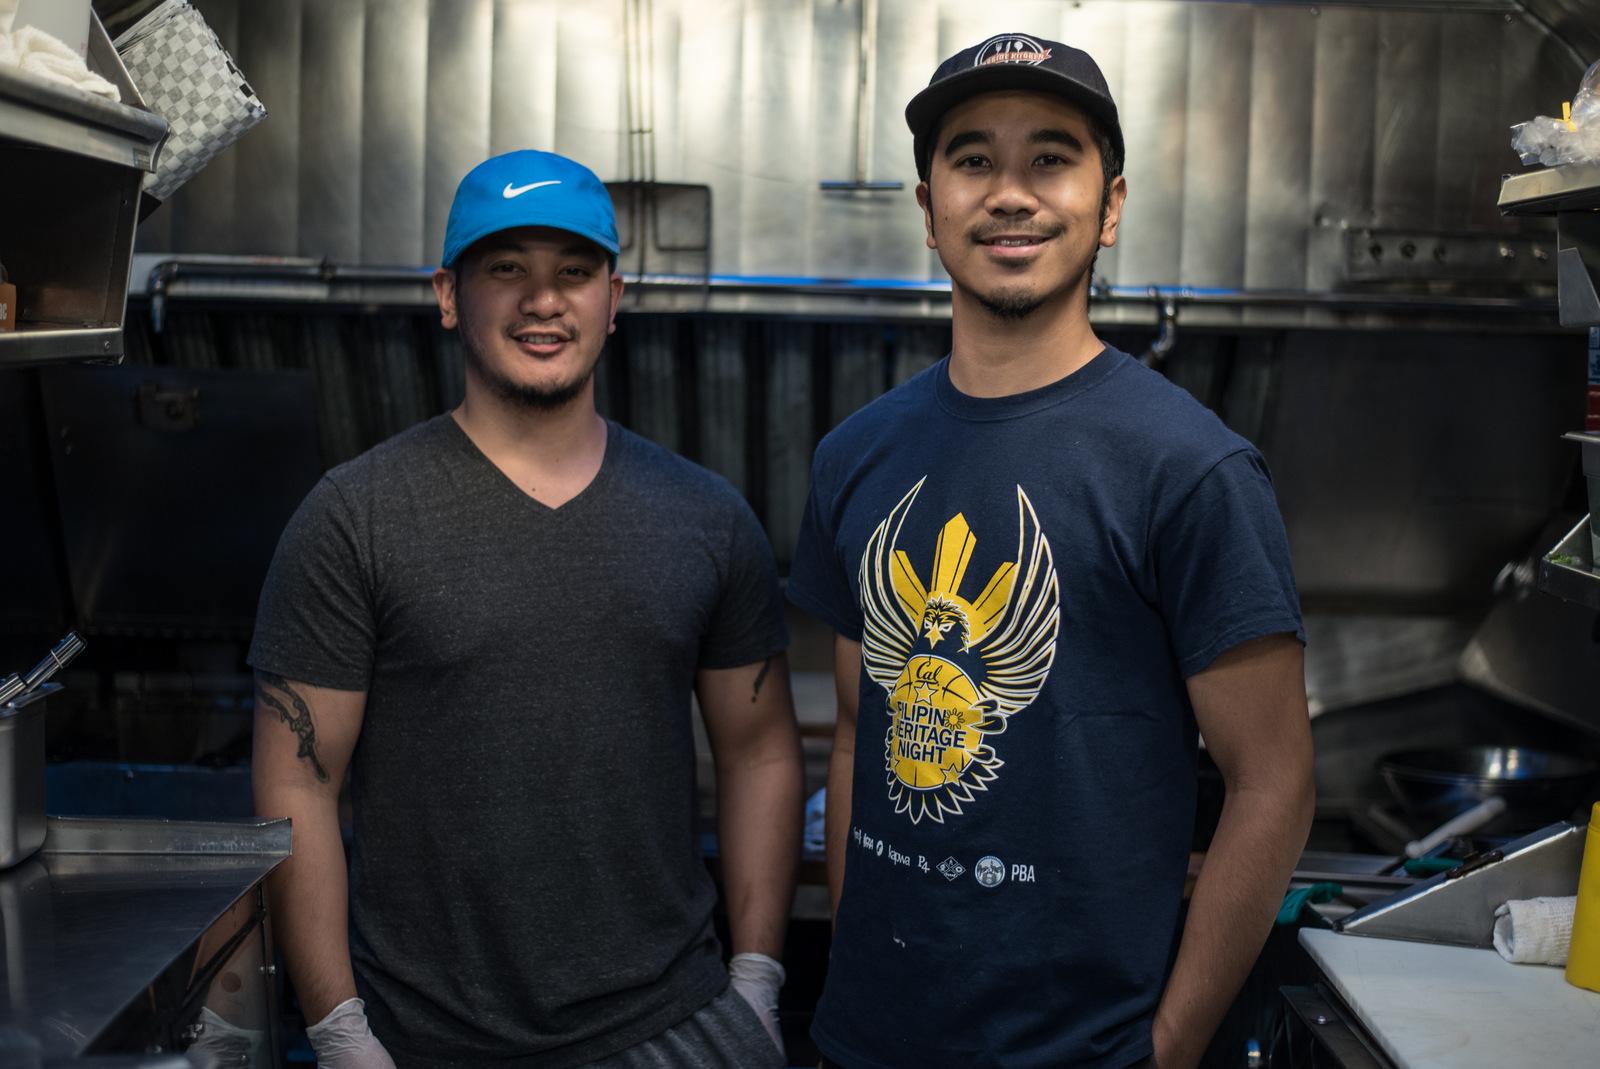 Curbside Kitchen Food Truck Serves up Filipino Gourmet